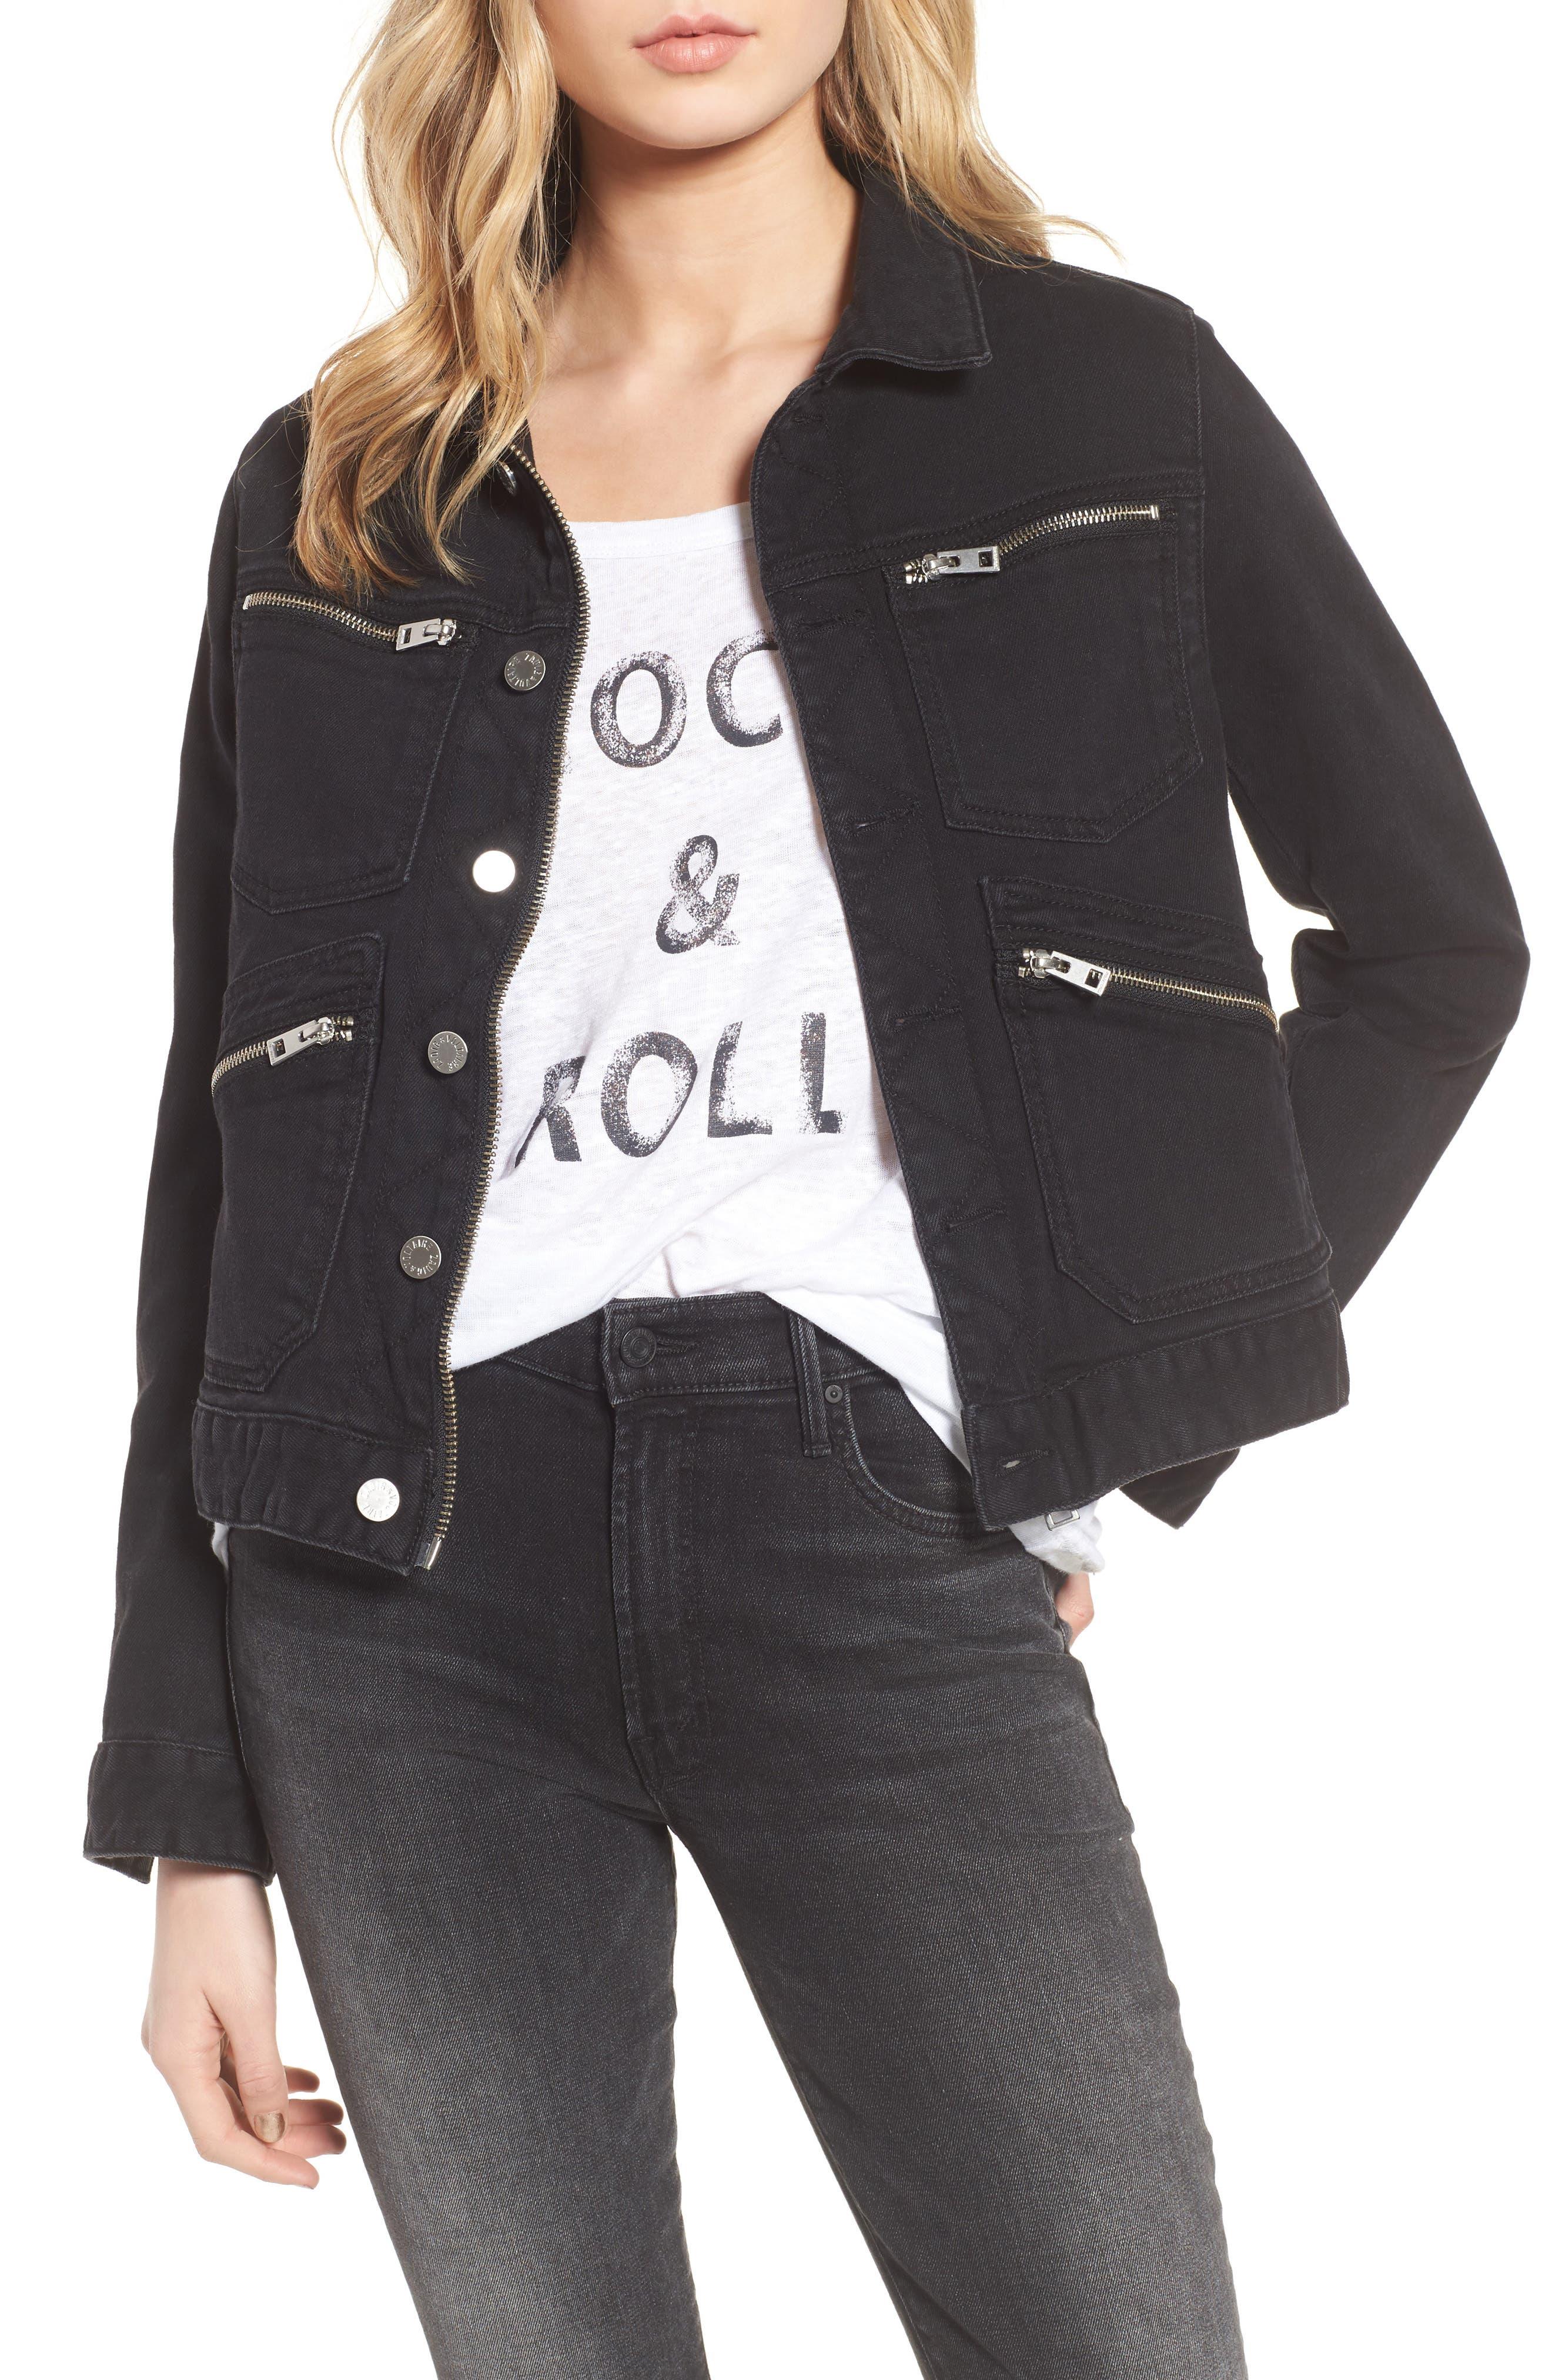 Kioko Cat Jacket,                         Main,                         color, Black